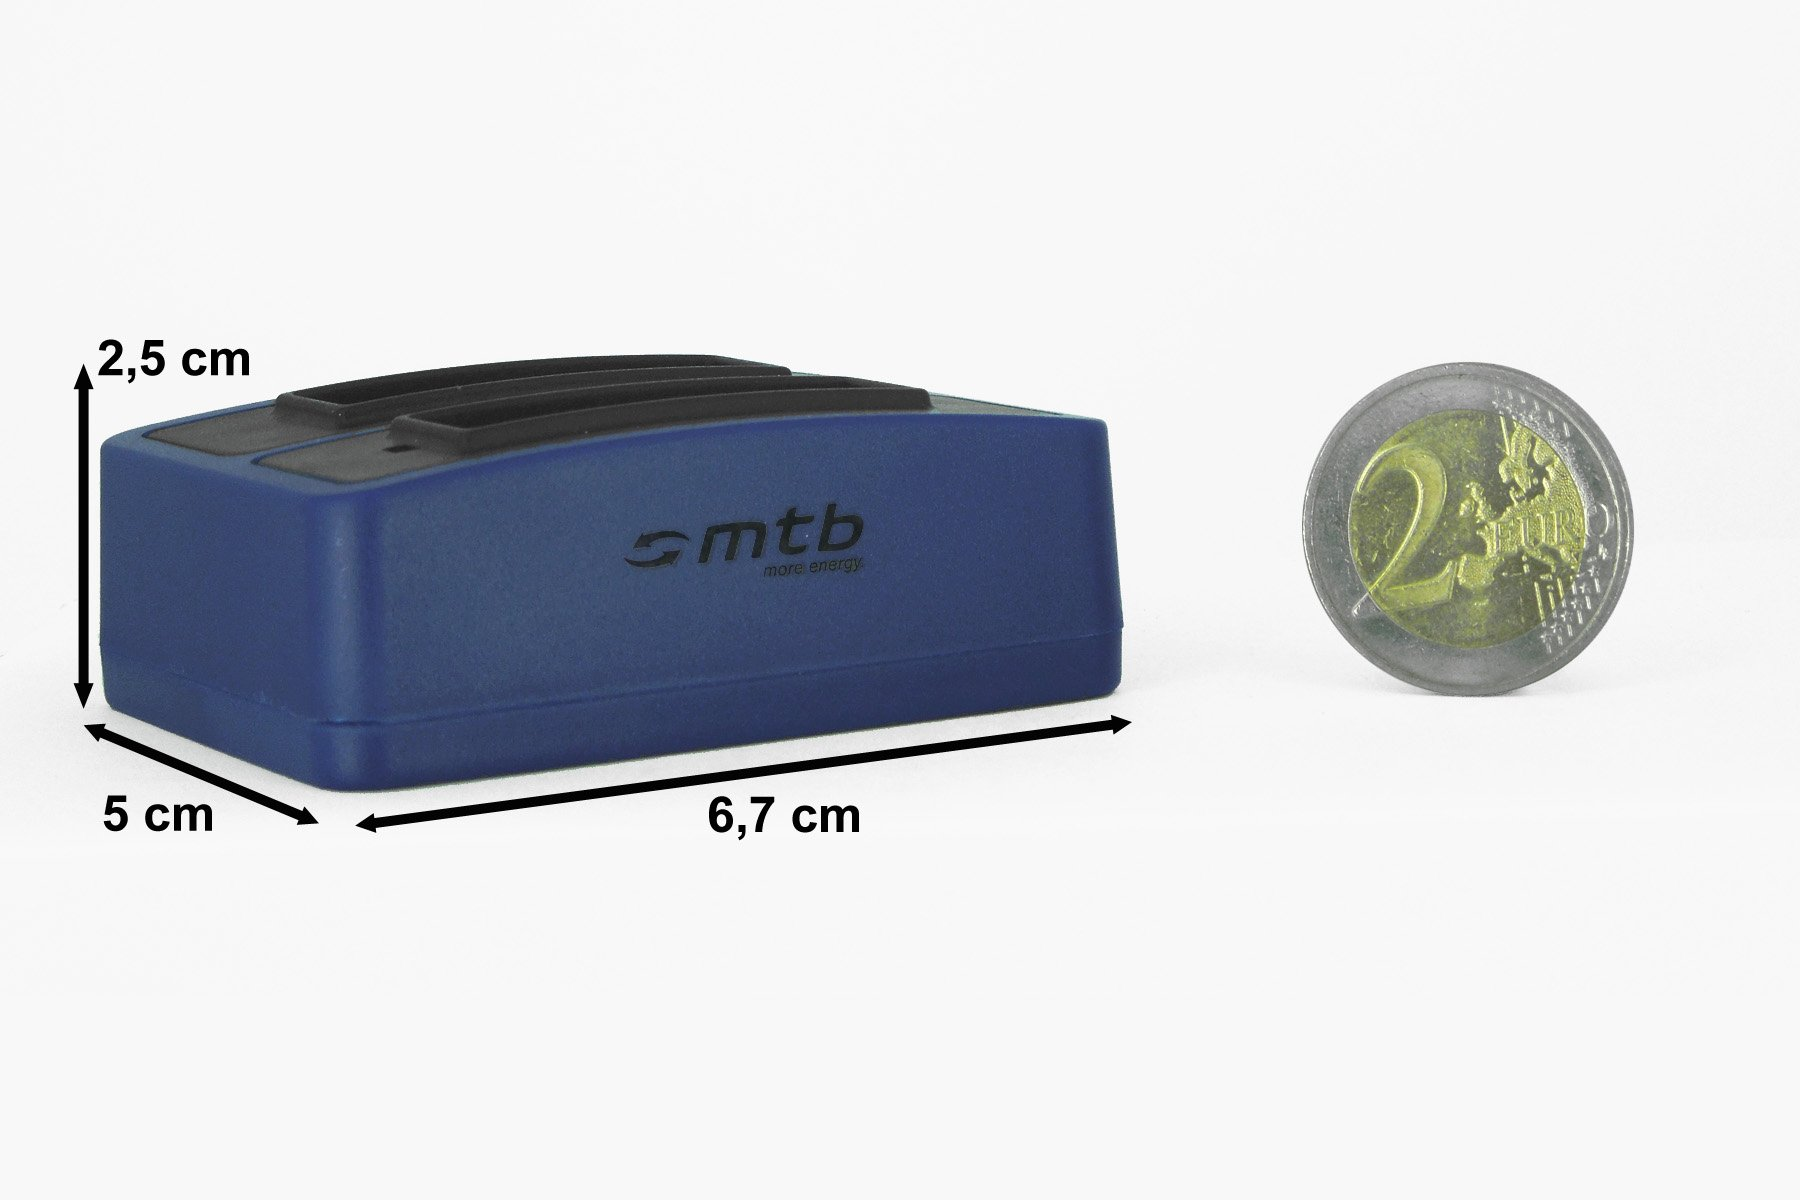 V AS20 v Lista AS100V para Sony NP-BX1 // Sony Action CAM HDR-AS10 USB//Coche//Corriente AS200V // FDR-X1000V AS30 Bater/ía Cargador Doble AS15